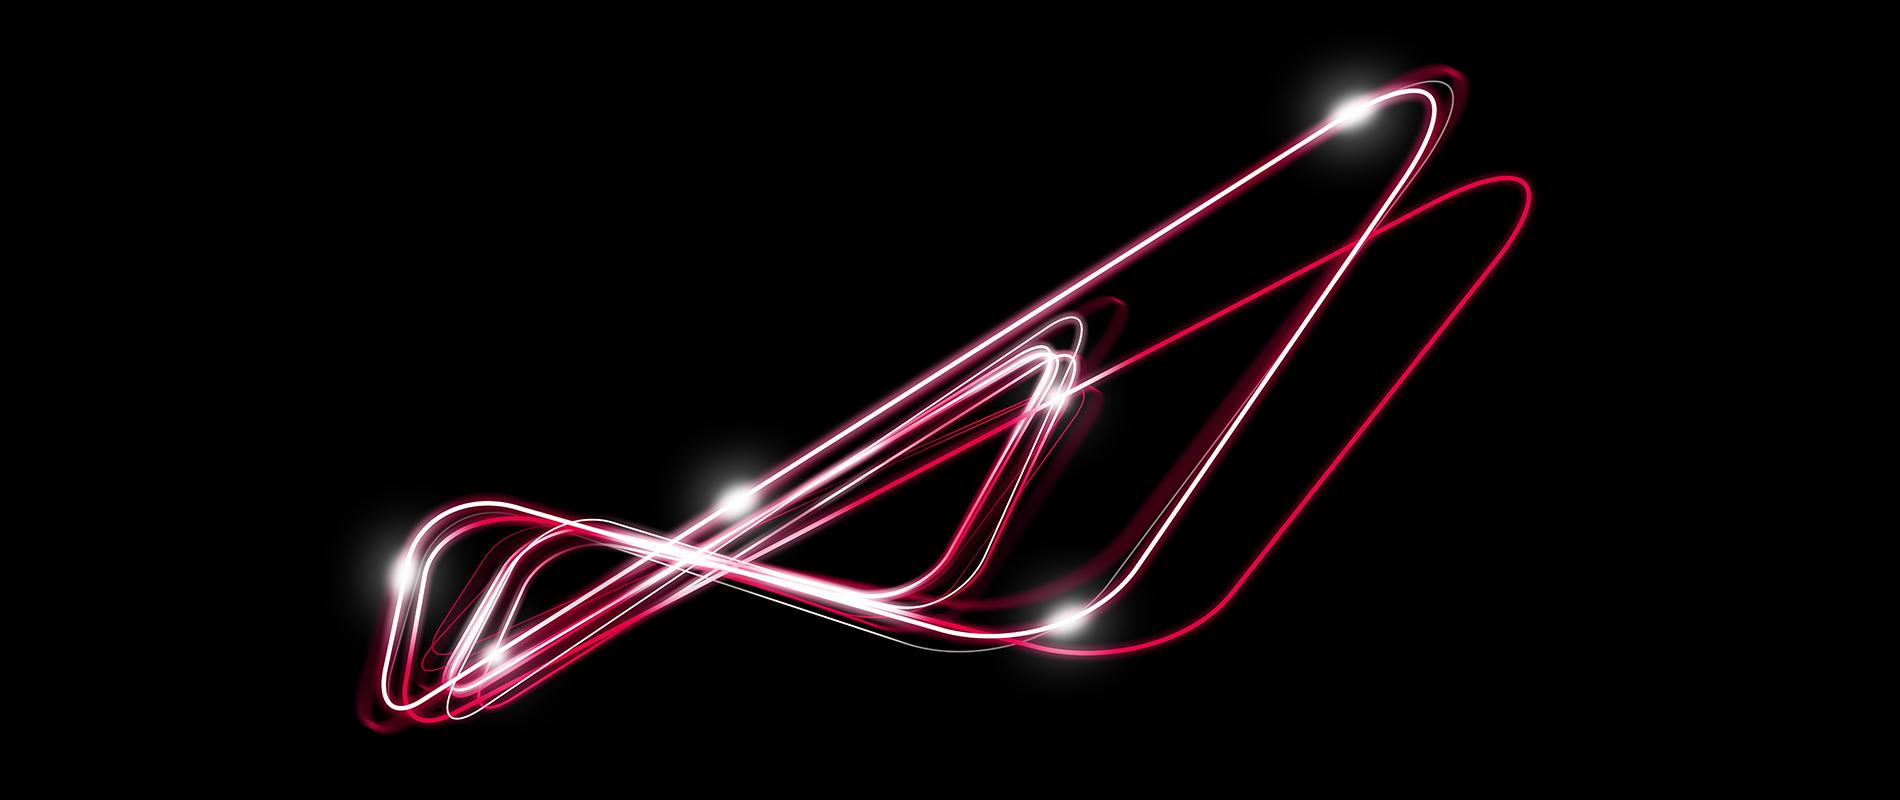 IVC New Image w Both Logos